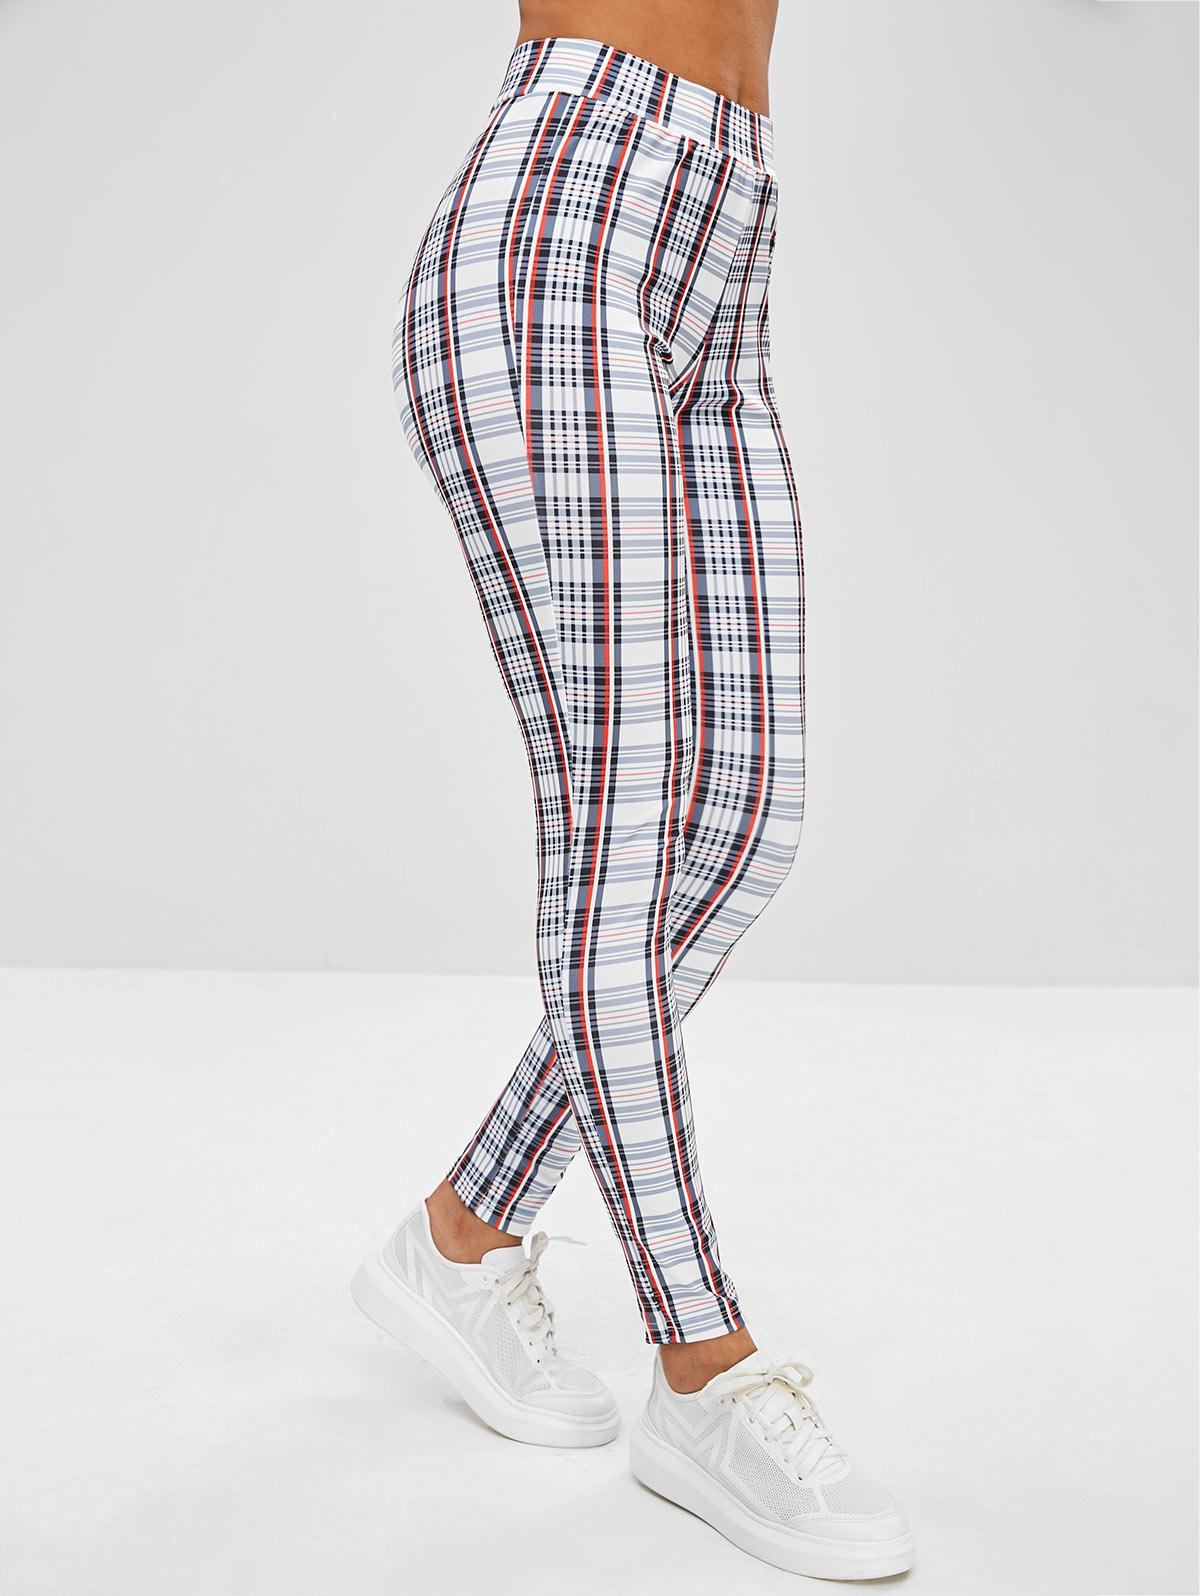 Plaid Skinny Pants